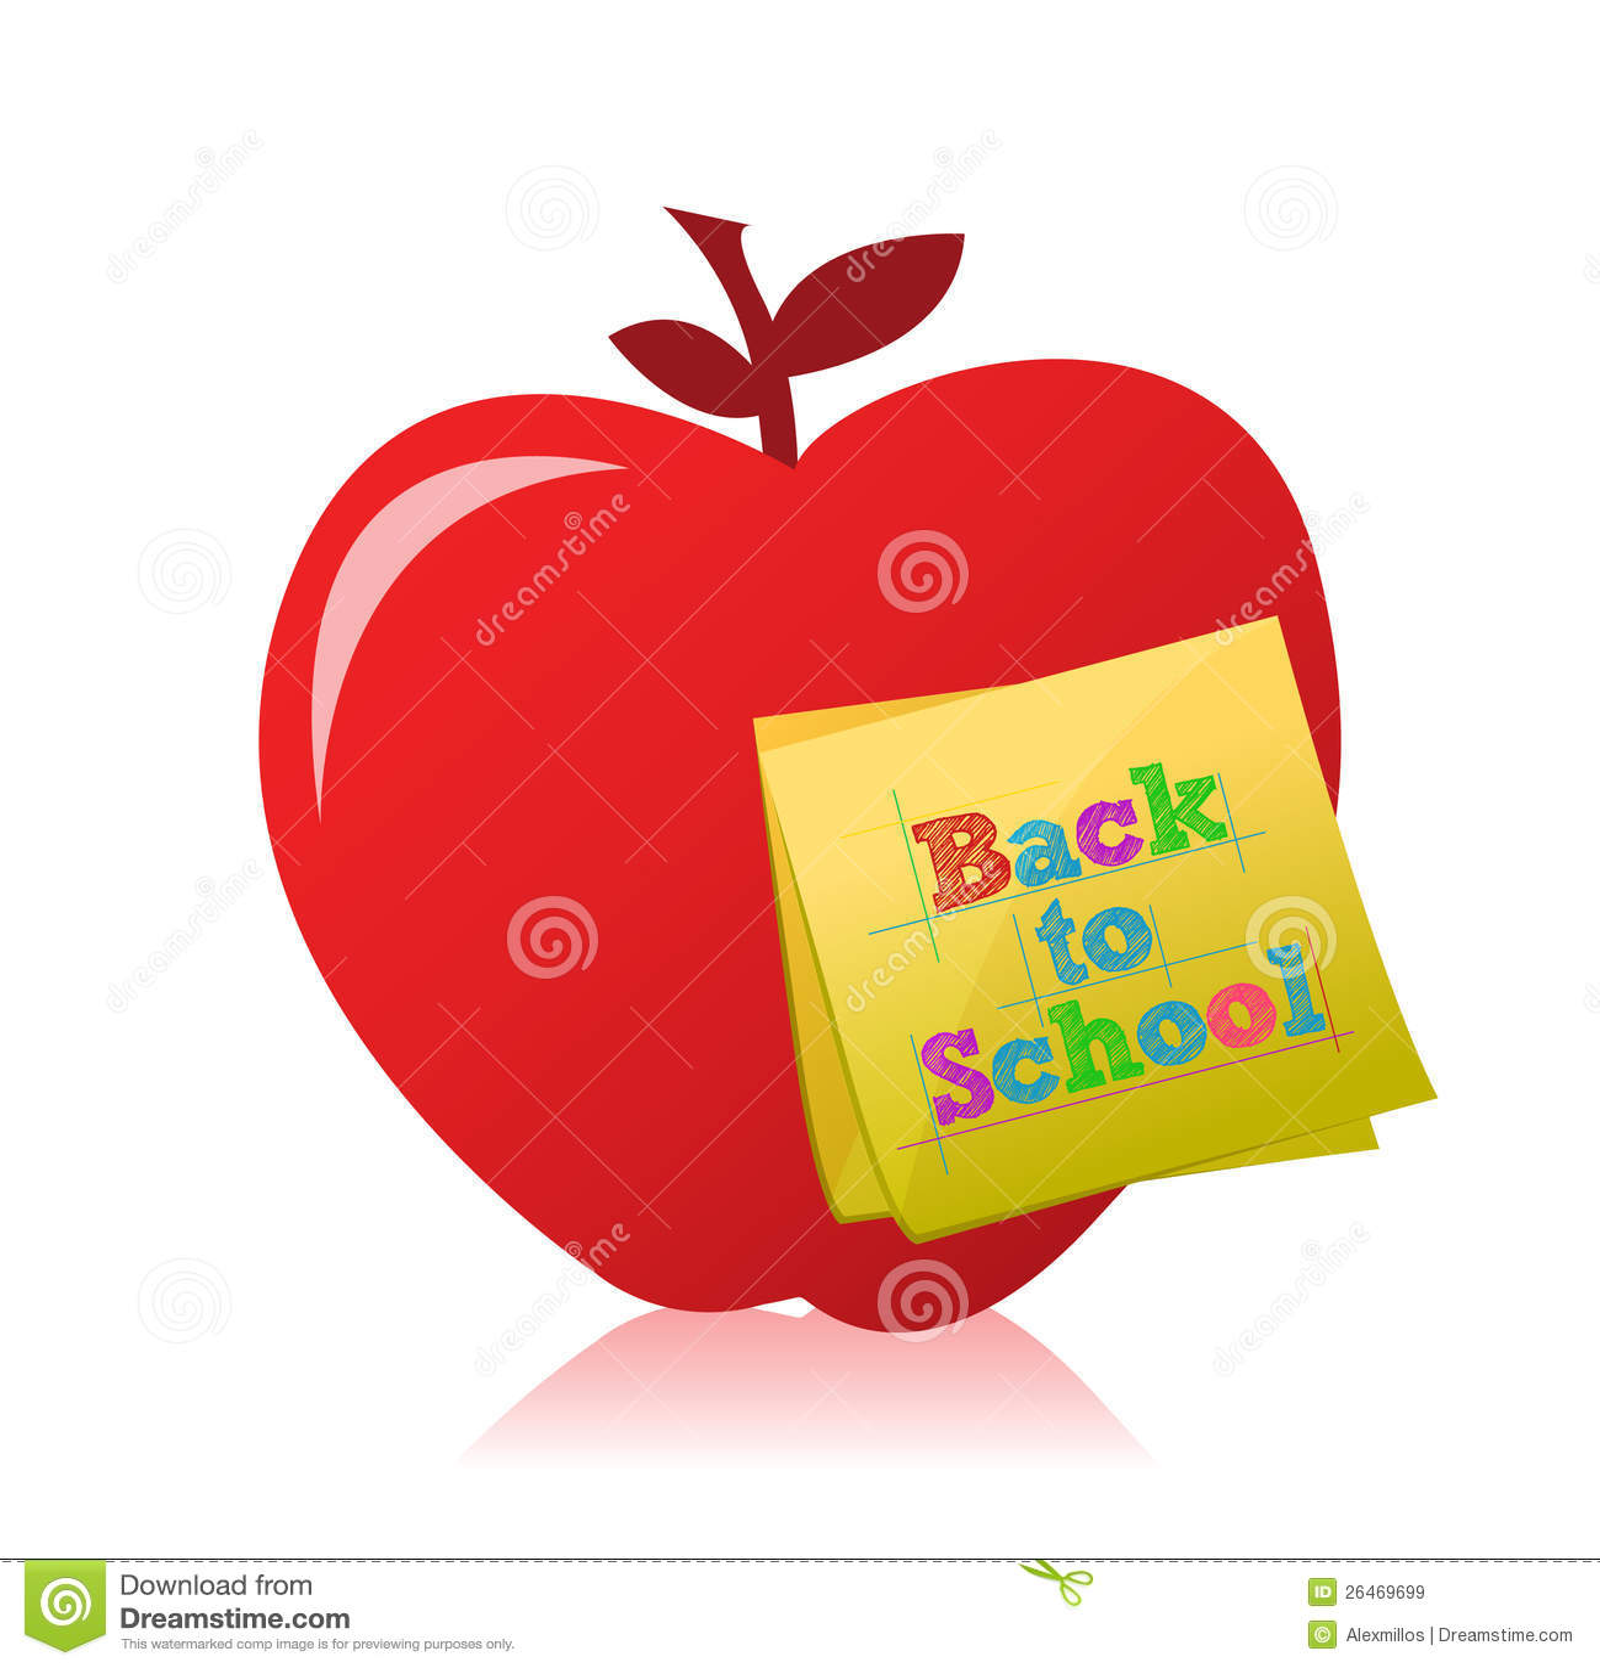 Back To School Apple Illustration Design Royalty Free